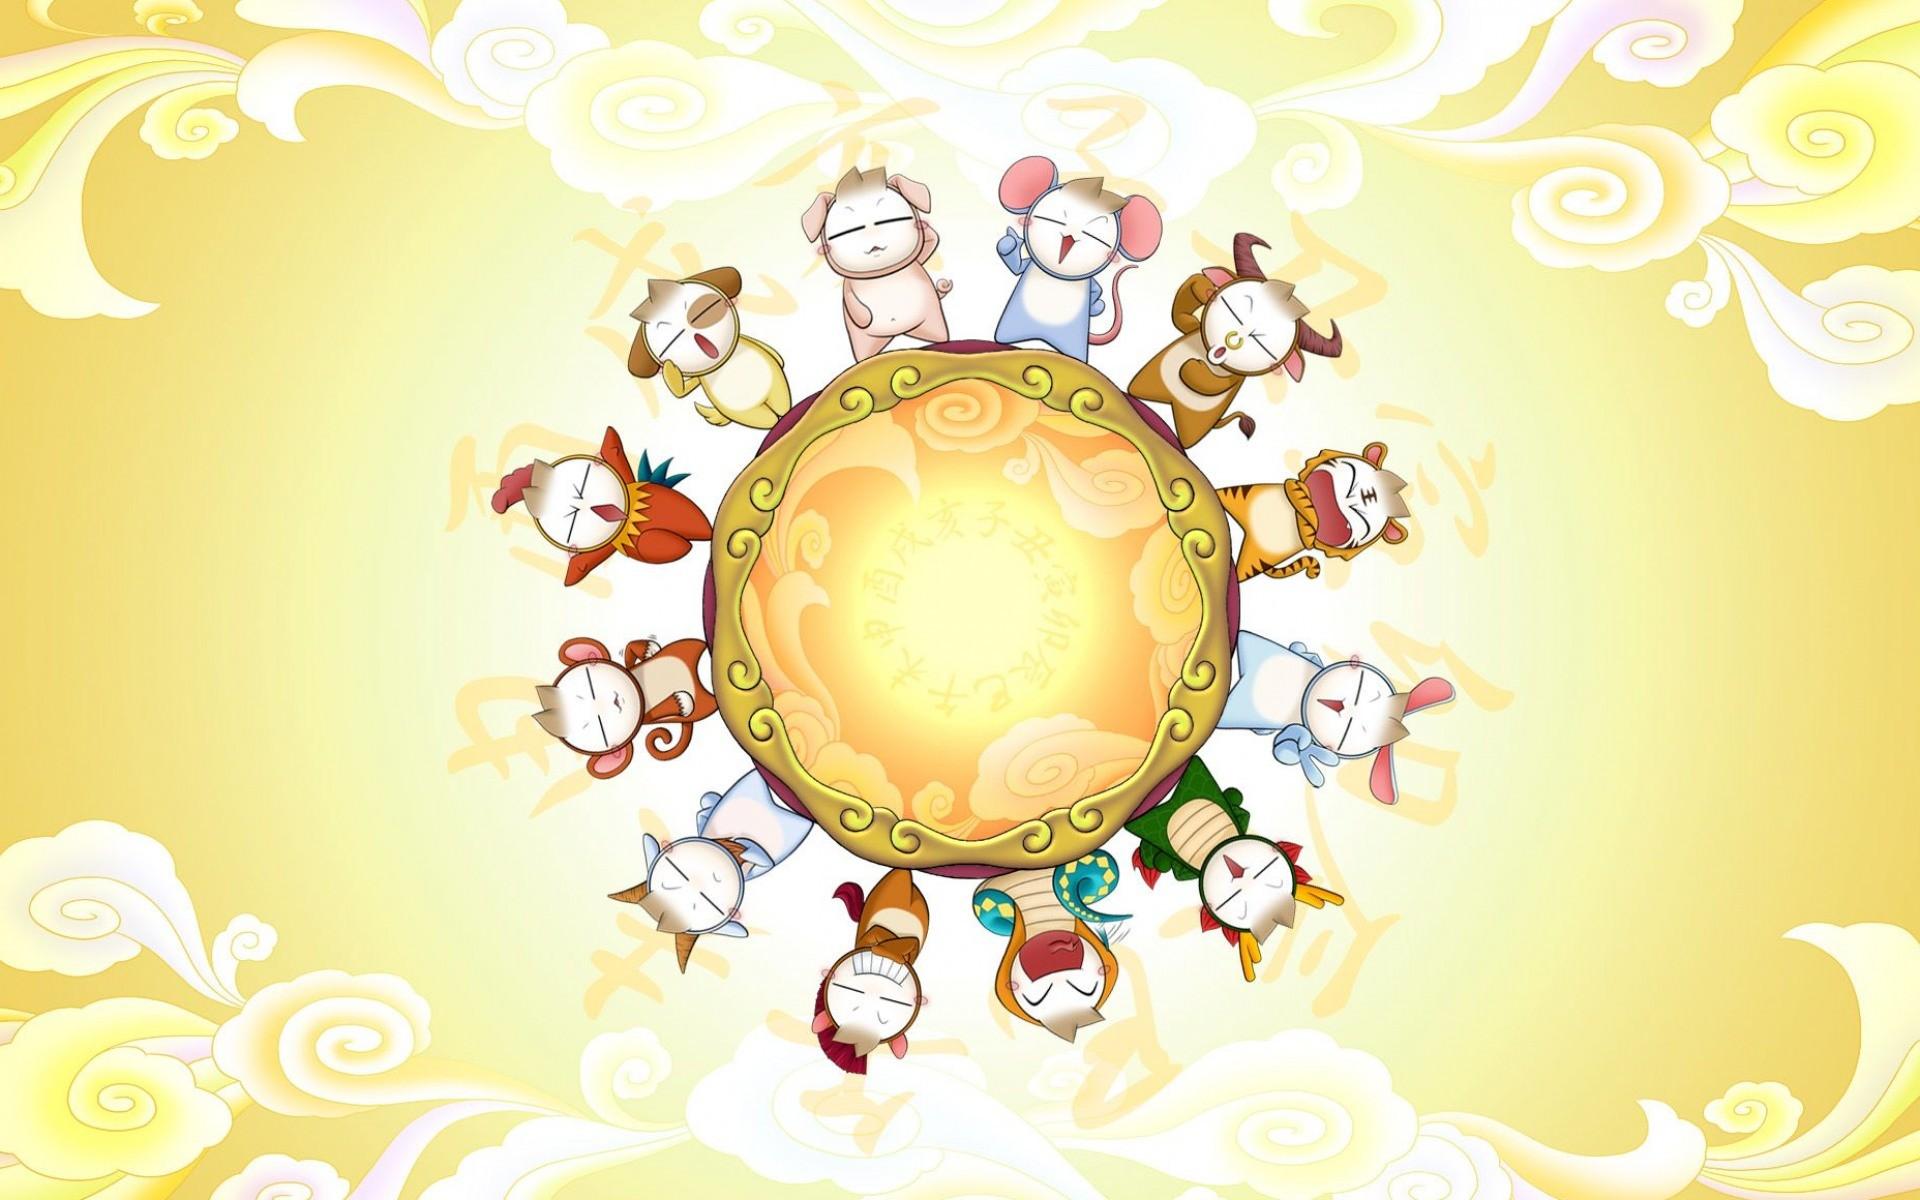 Res: 1920x1200, cute, cartoon, chinese, calendar, astrology, animal